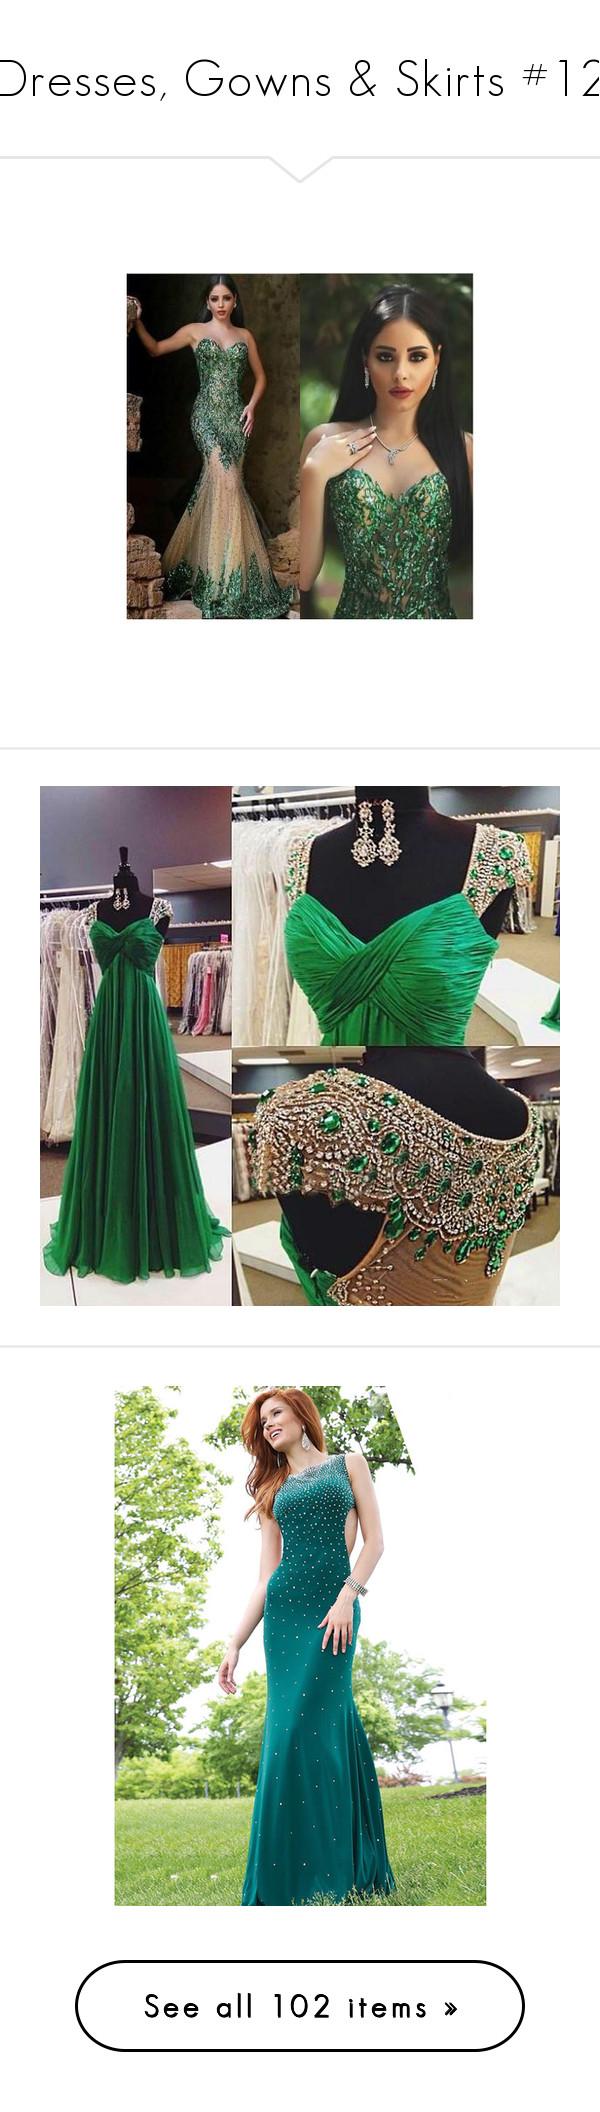 Dresses gowns u skirts